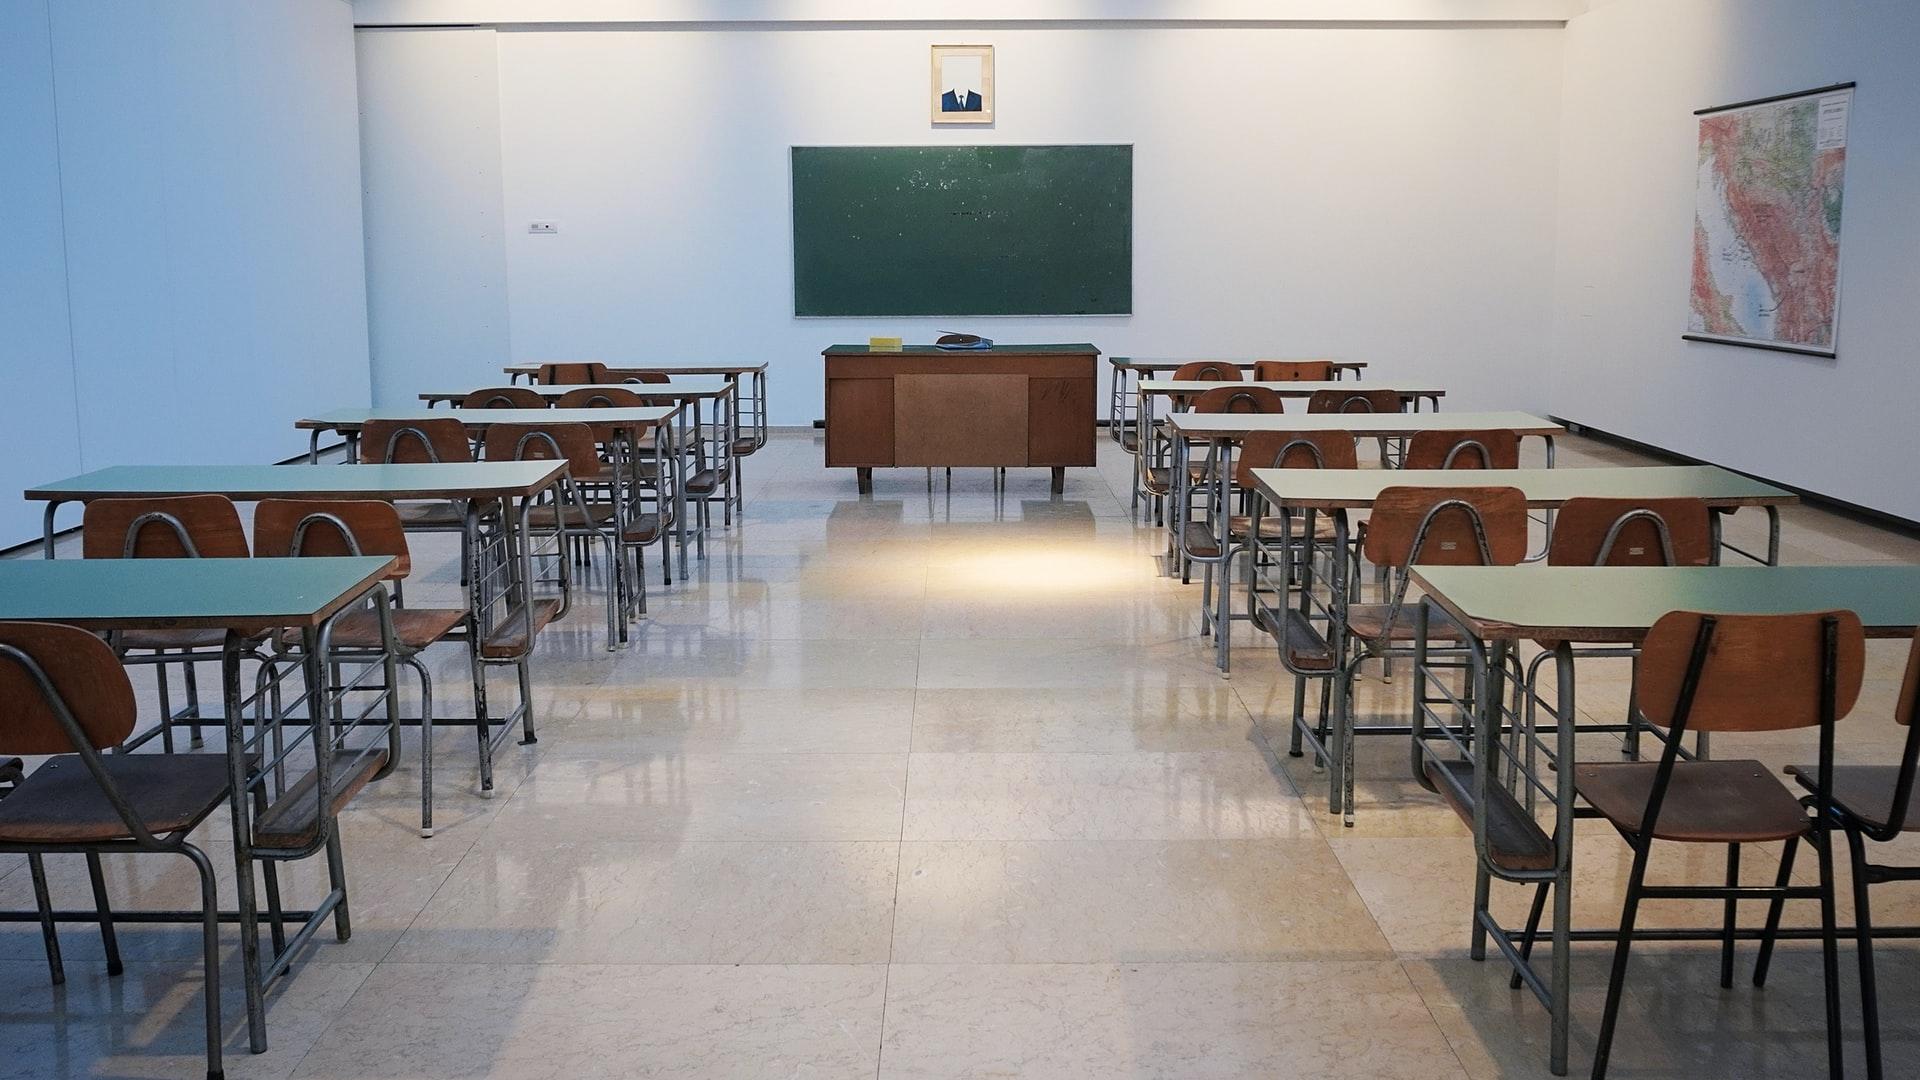 International school in India